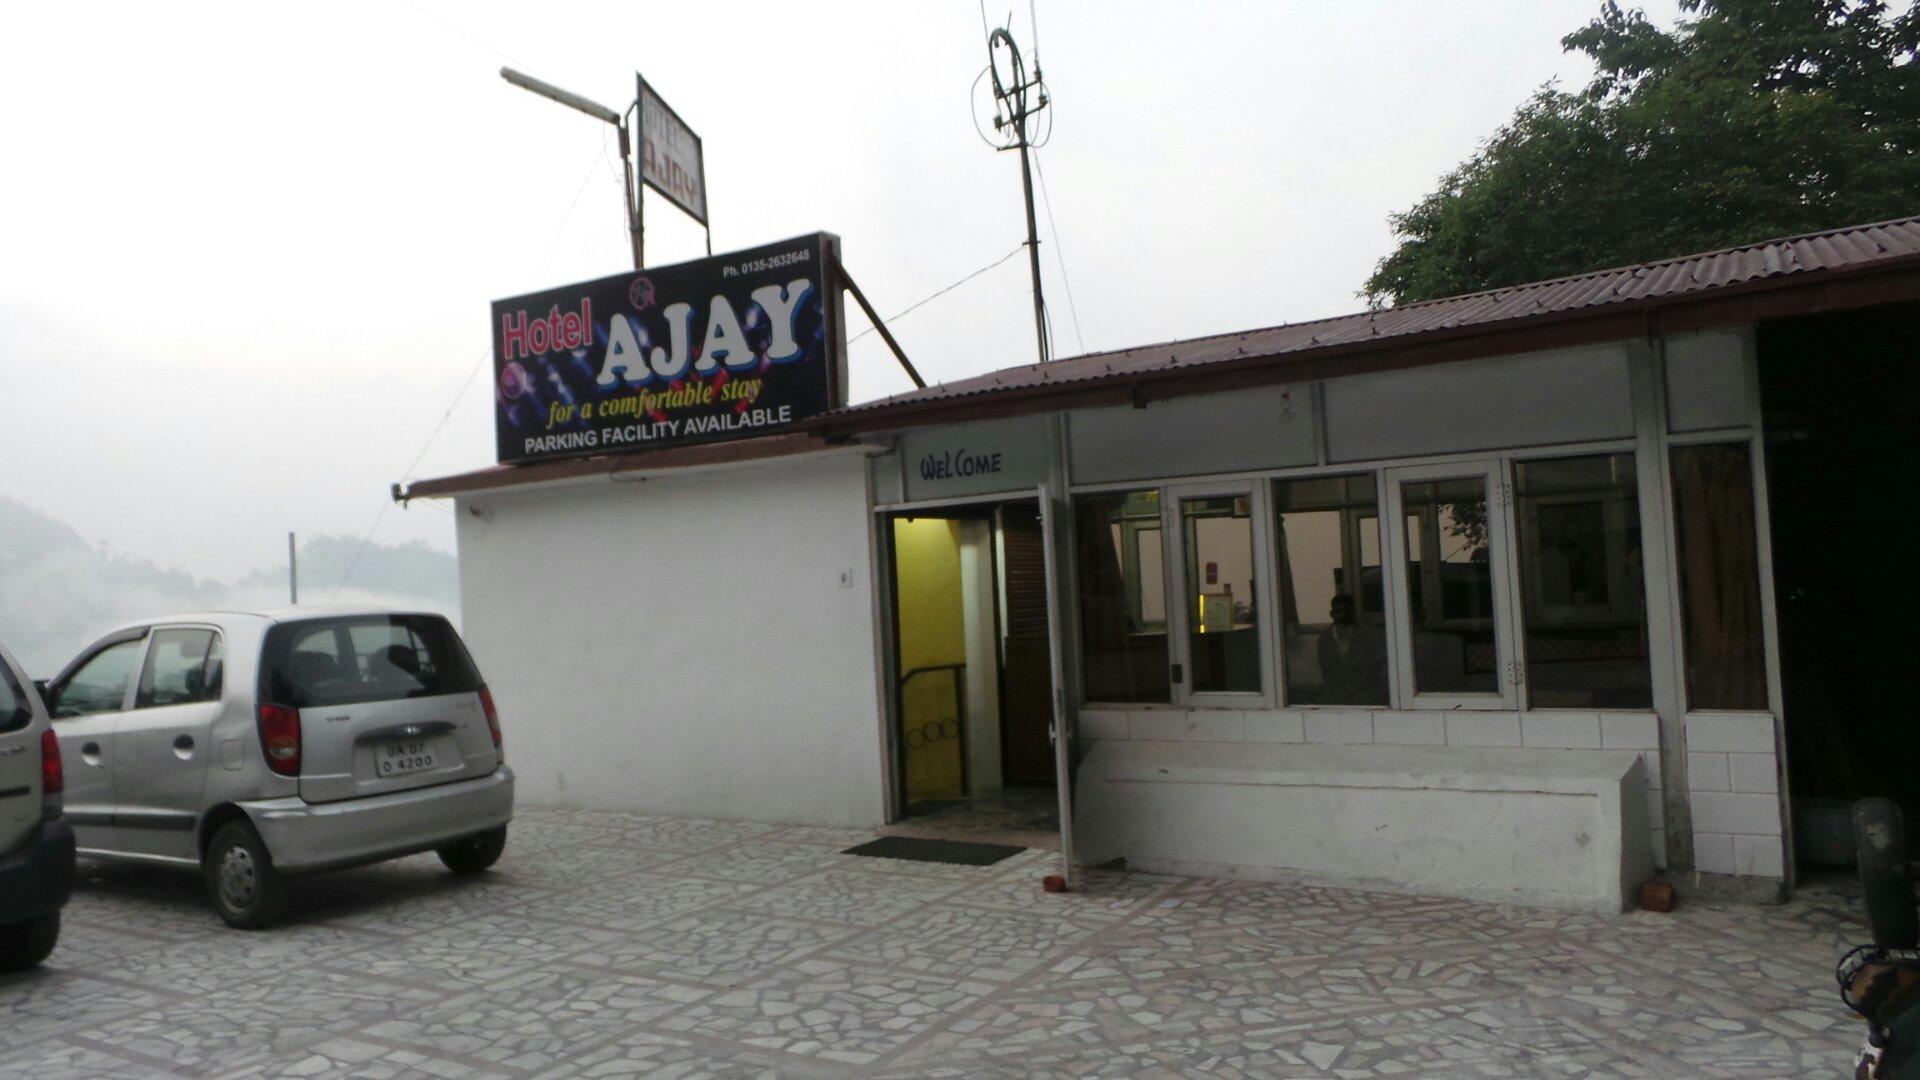 Hotel Ajay in Mussoorie